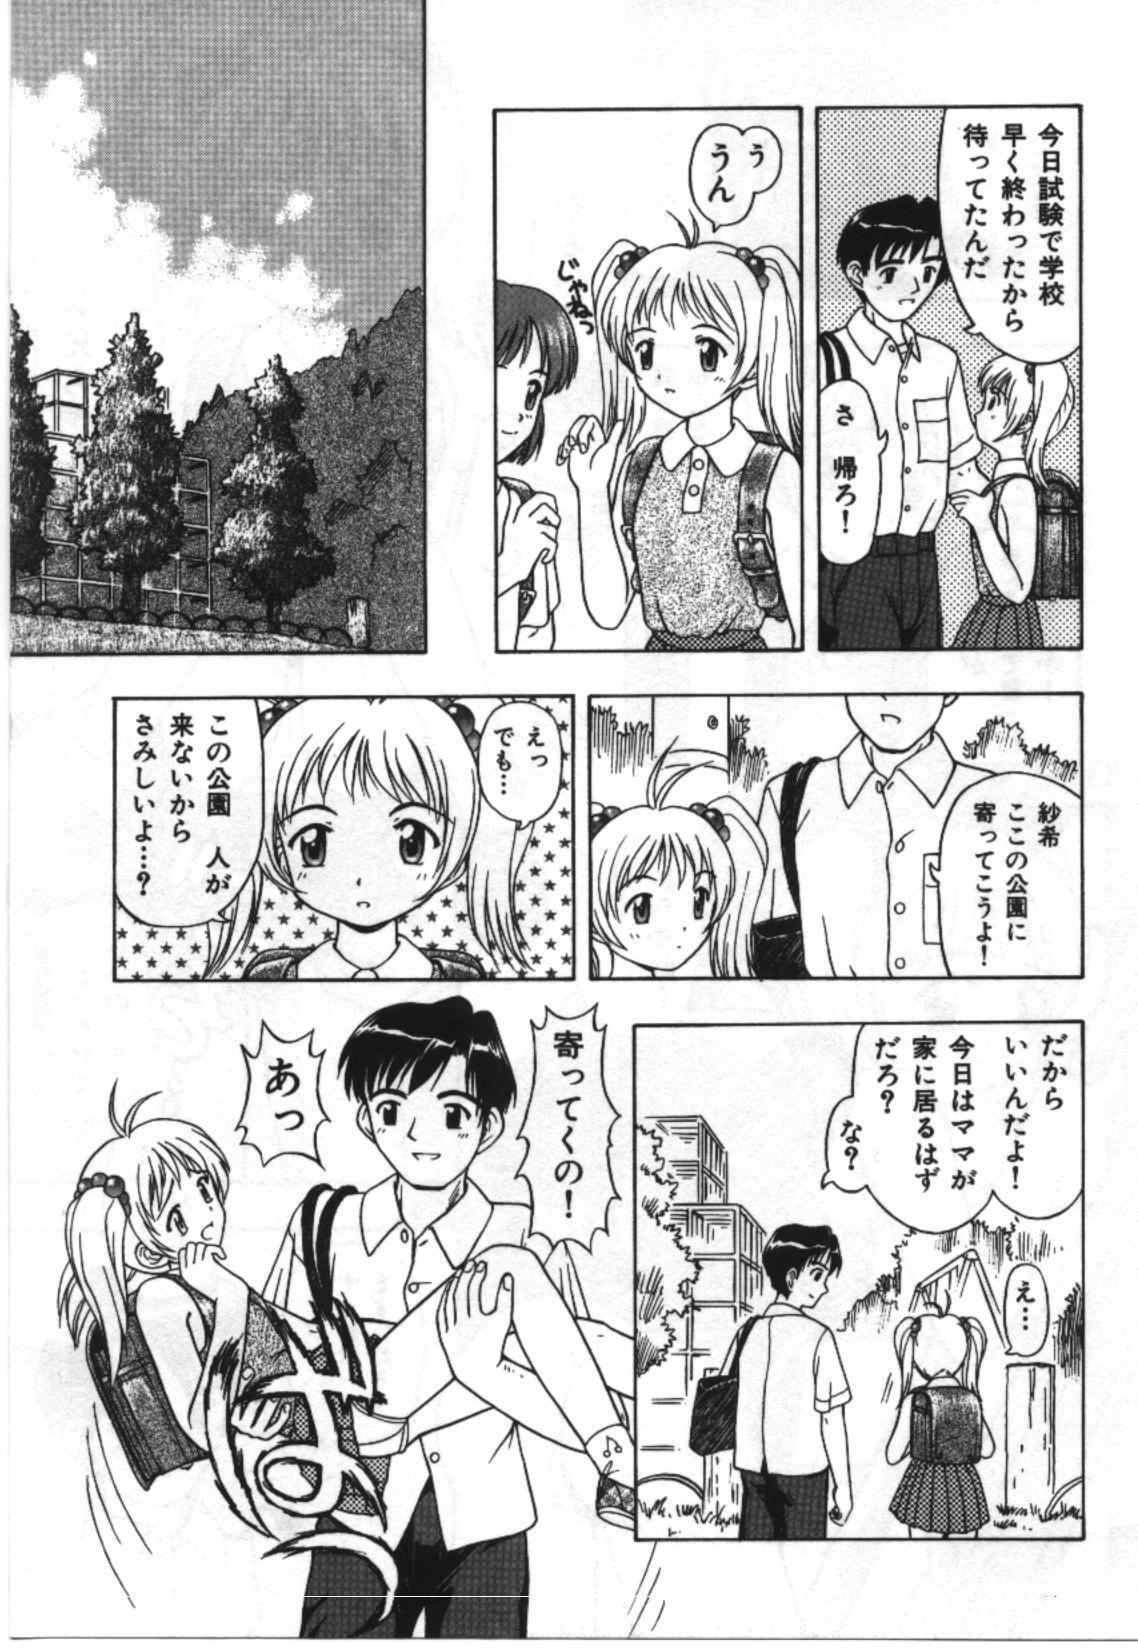 Imouto Koishi 2 52